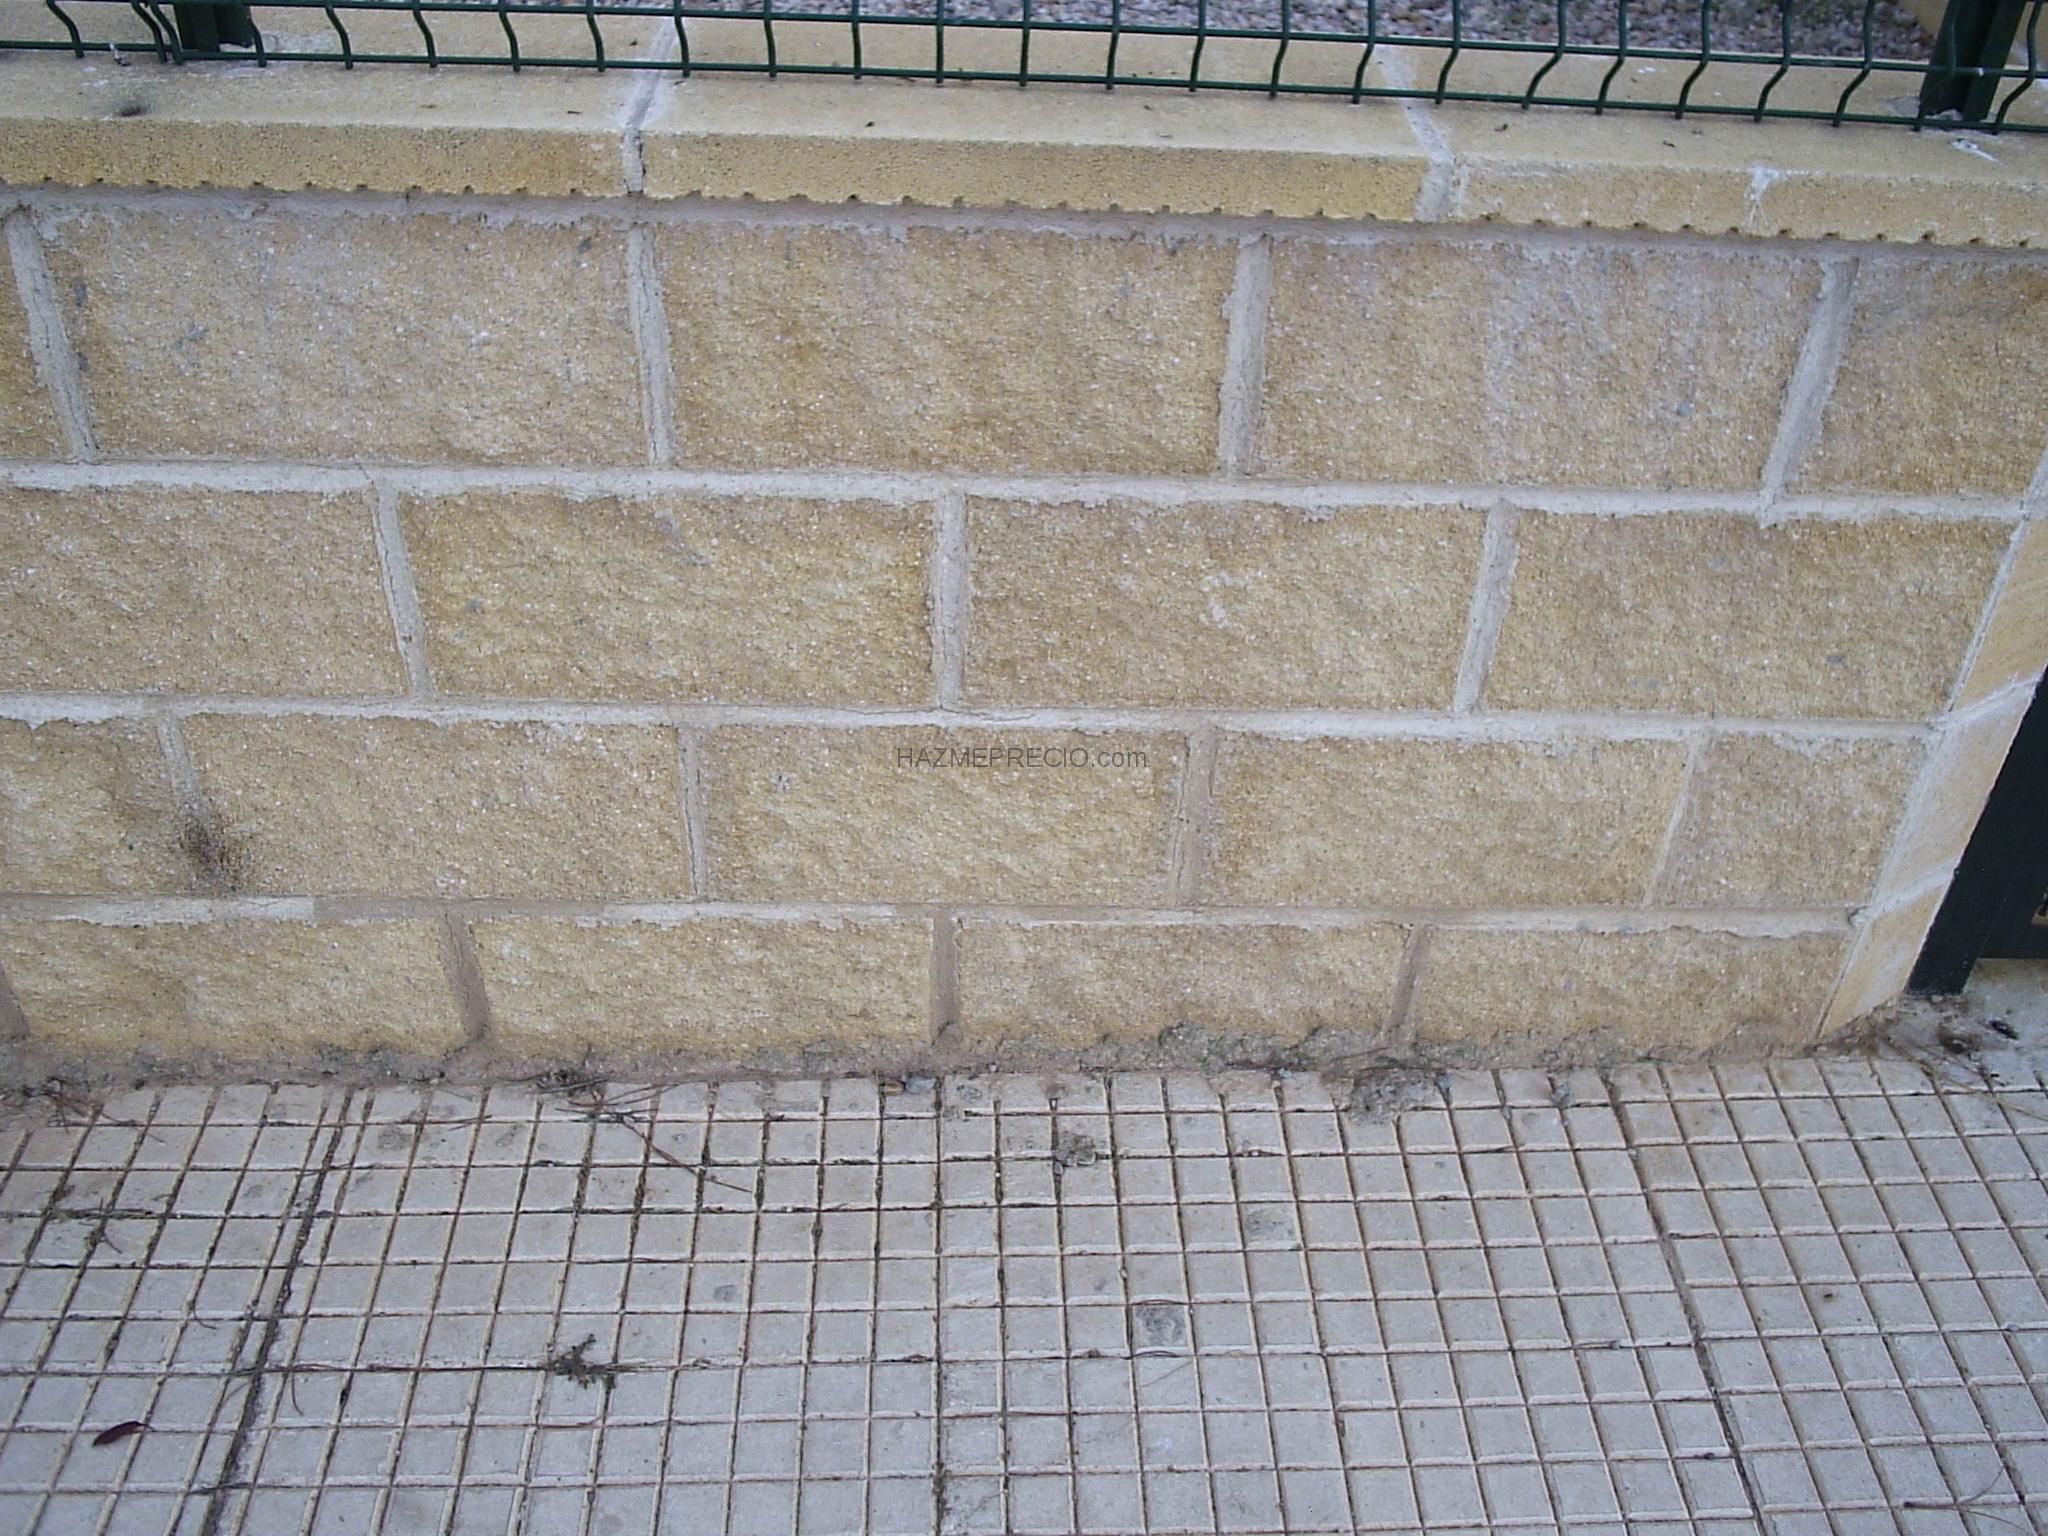 Casa de este alojamiento aislar paredes de hormigon mexico - Aislar paredes termicamente ...